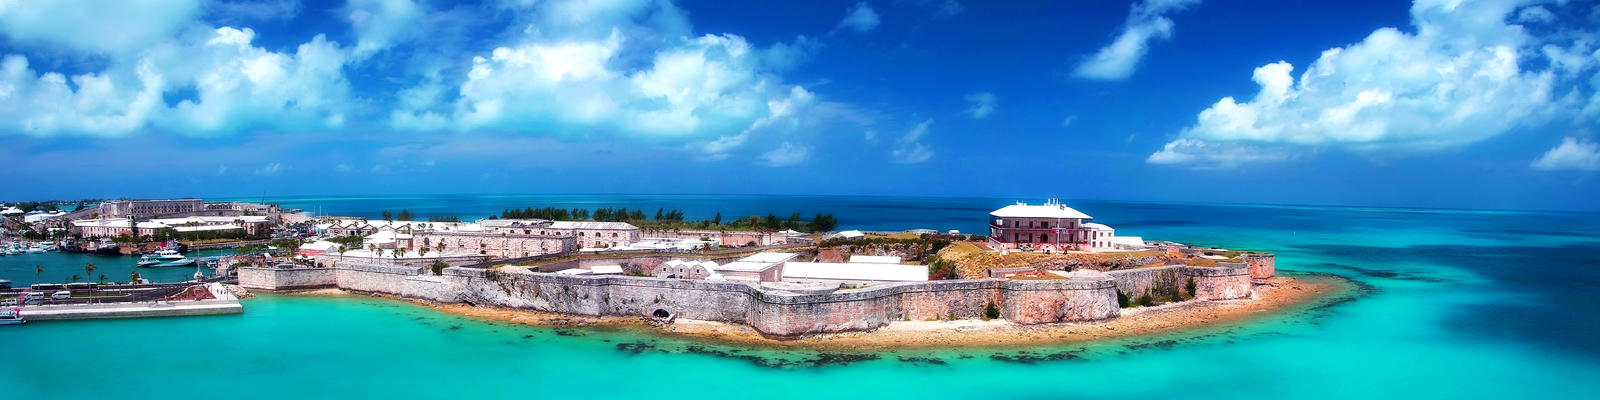 Panorama of the King's Wharf in Bermuda (Photo: Just dance/Shutterstock)